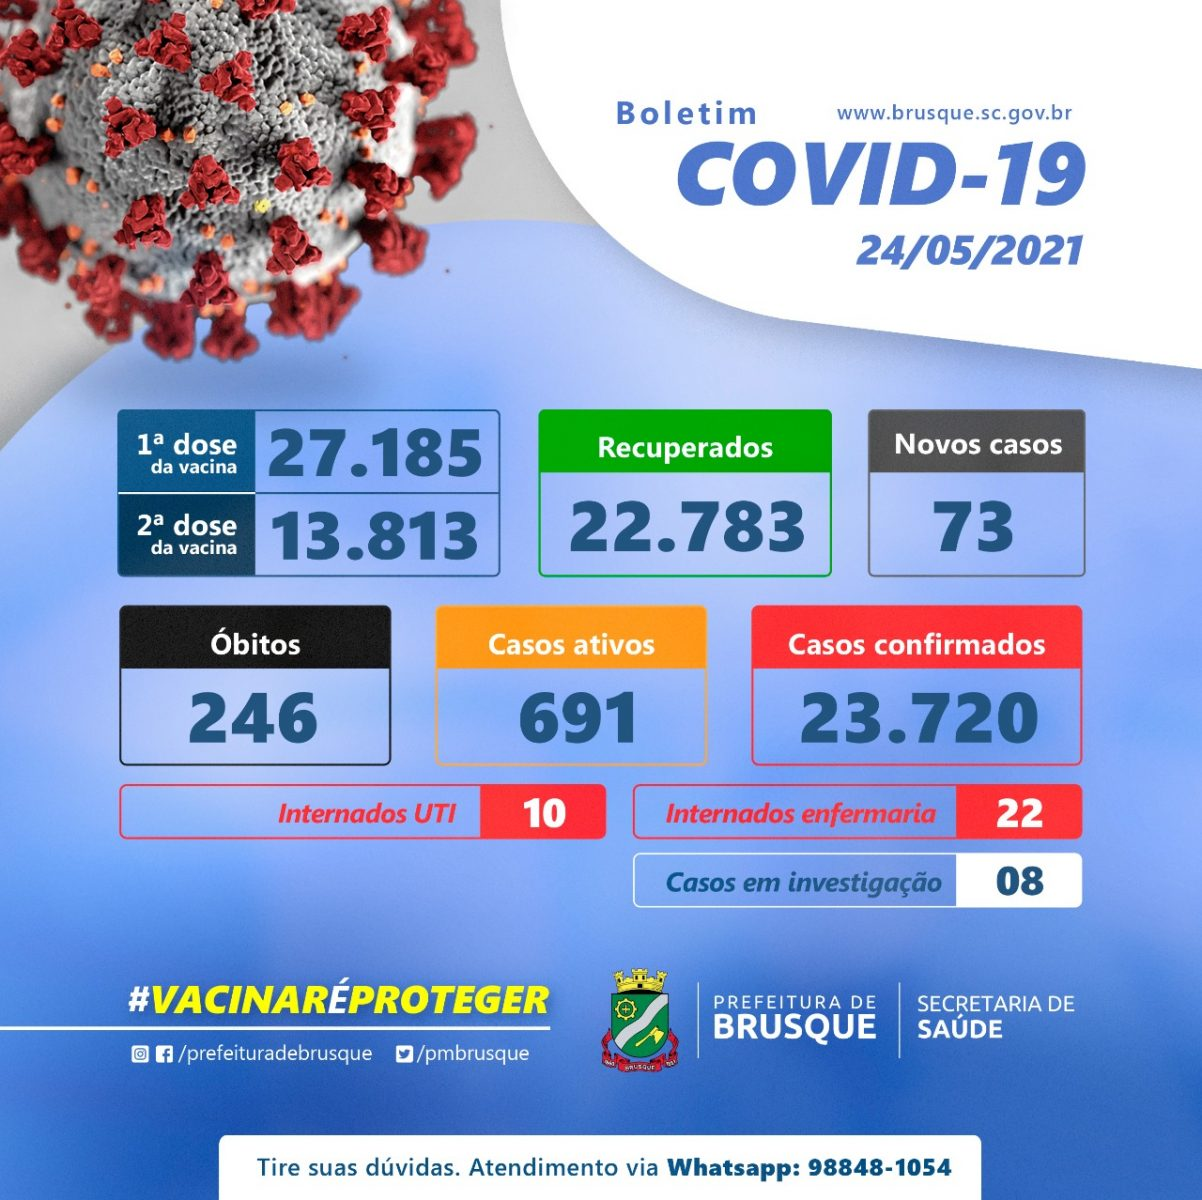 Covid-19: Confira o boletim epidemiológico desta segunda-feira (24)